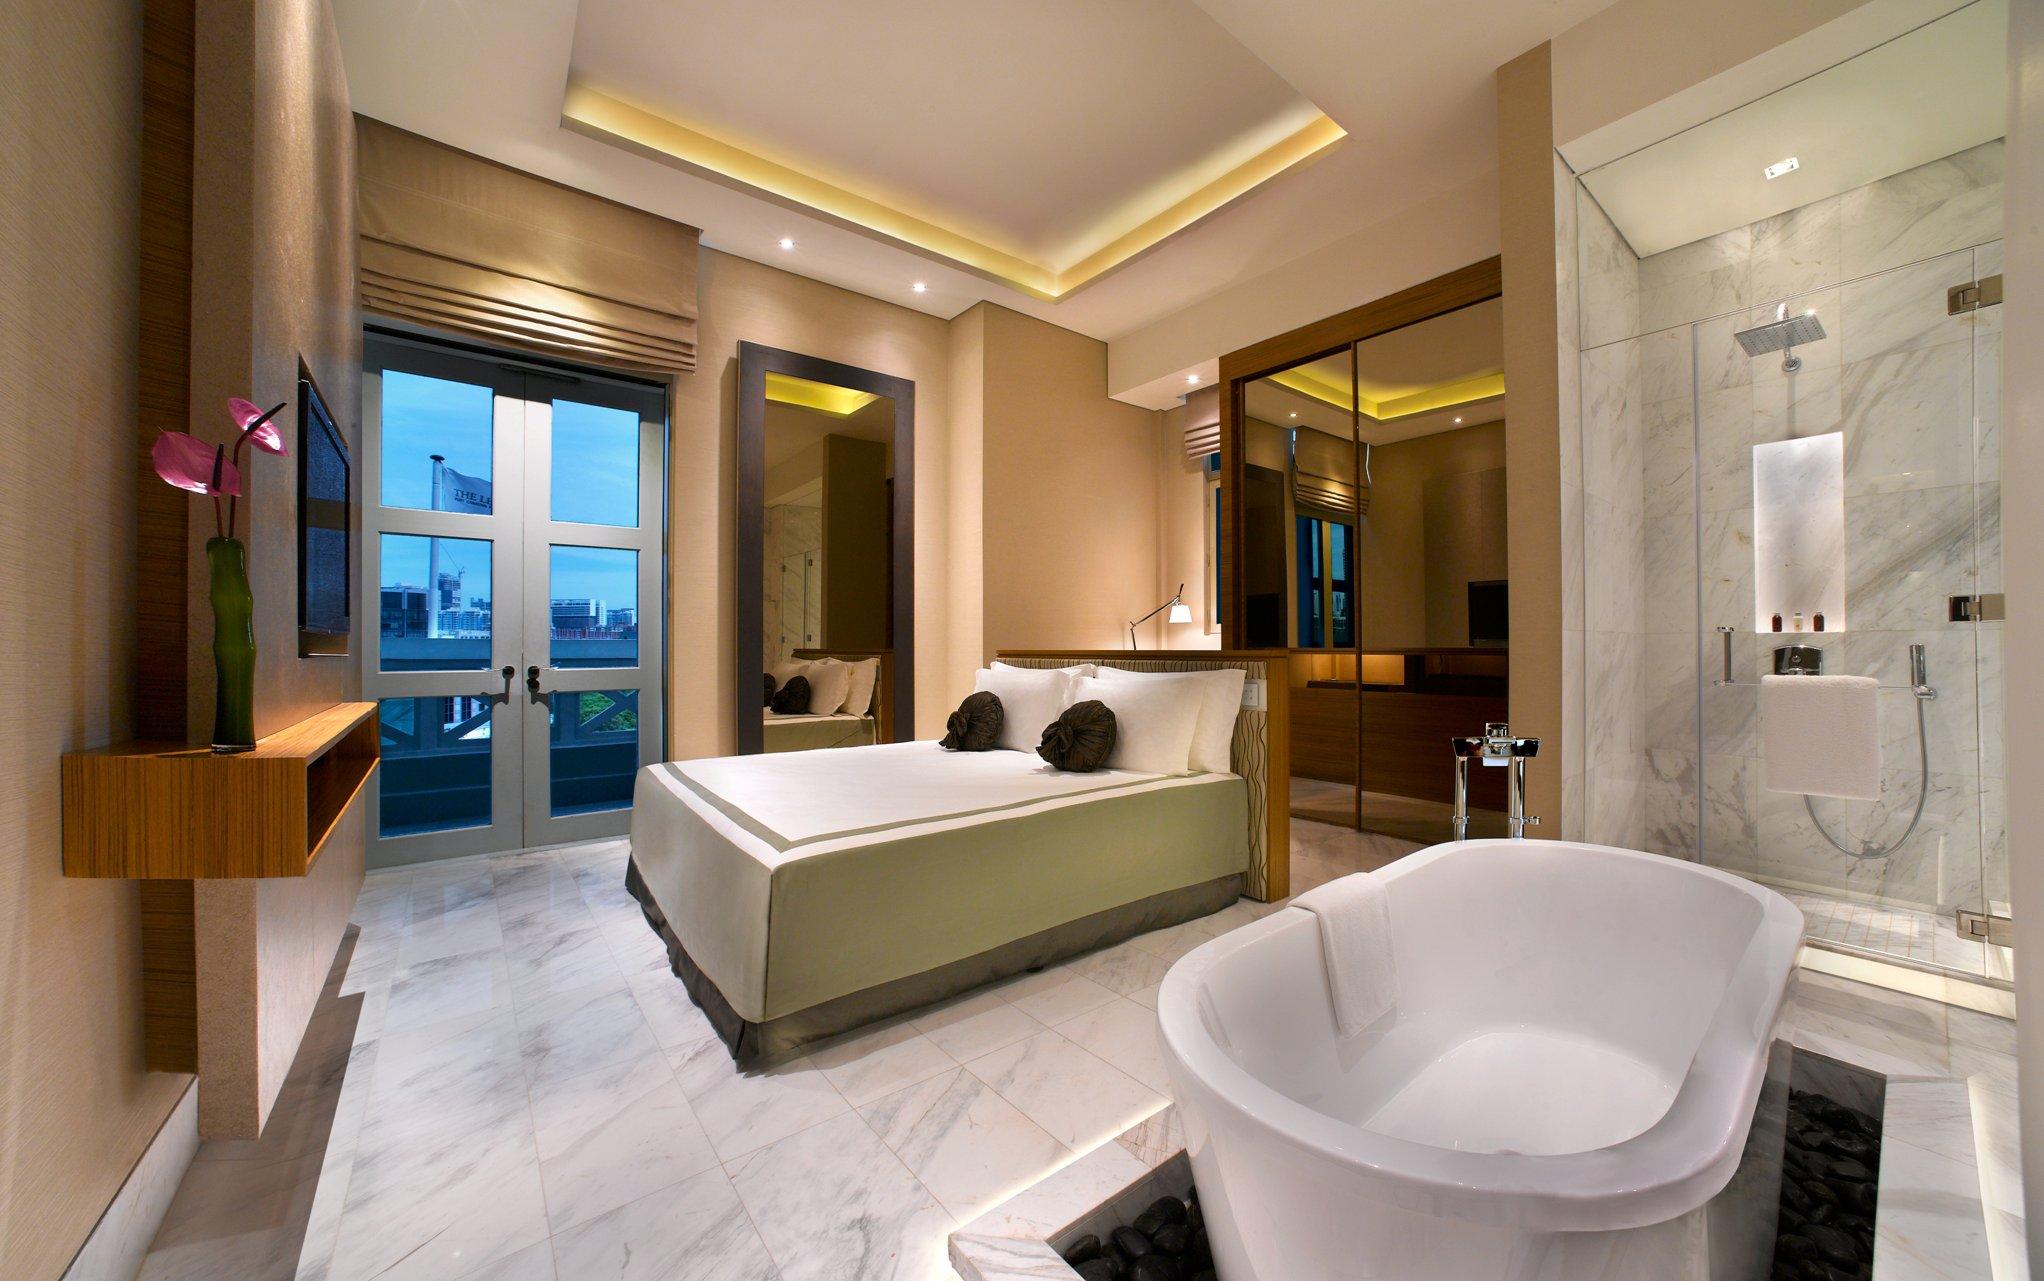 Combo 5 Function Bath Shower Head